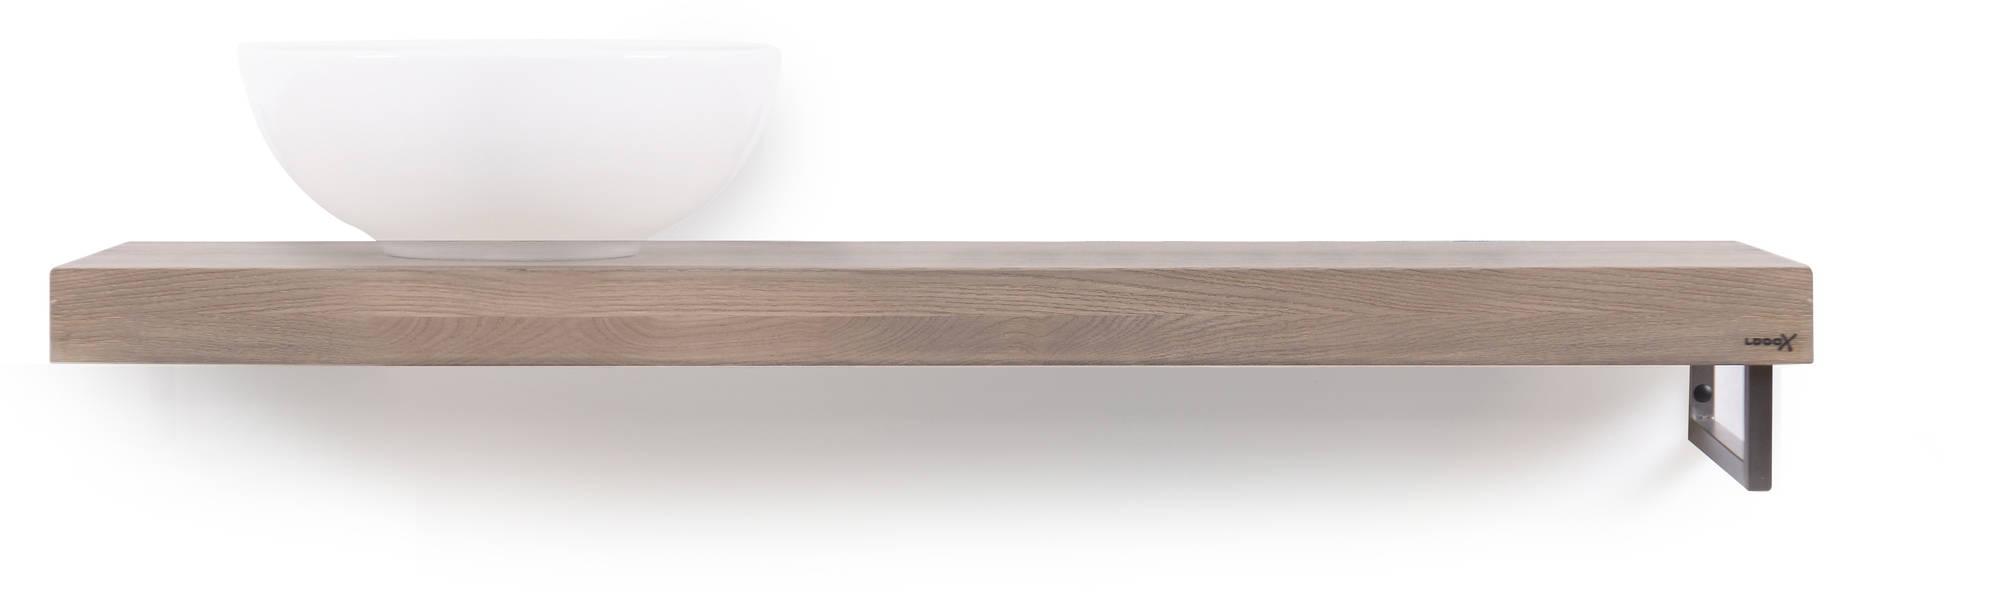 Looox Wooden Base Shelf Solo 120 cm Houder Rechts Old Grey/RVS